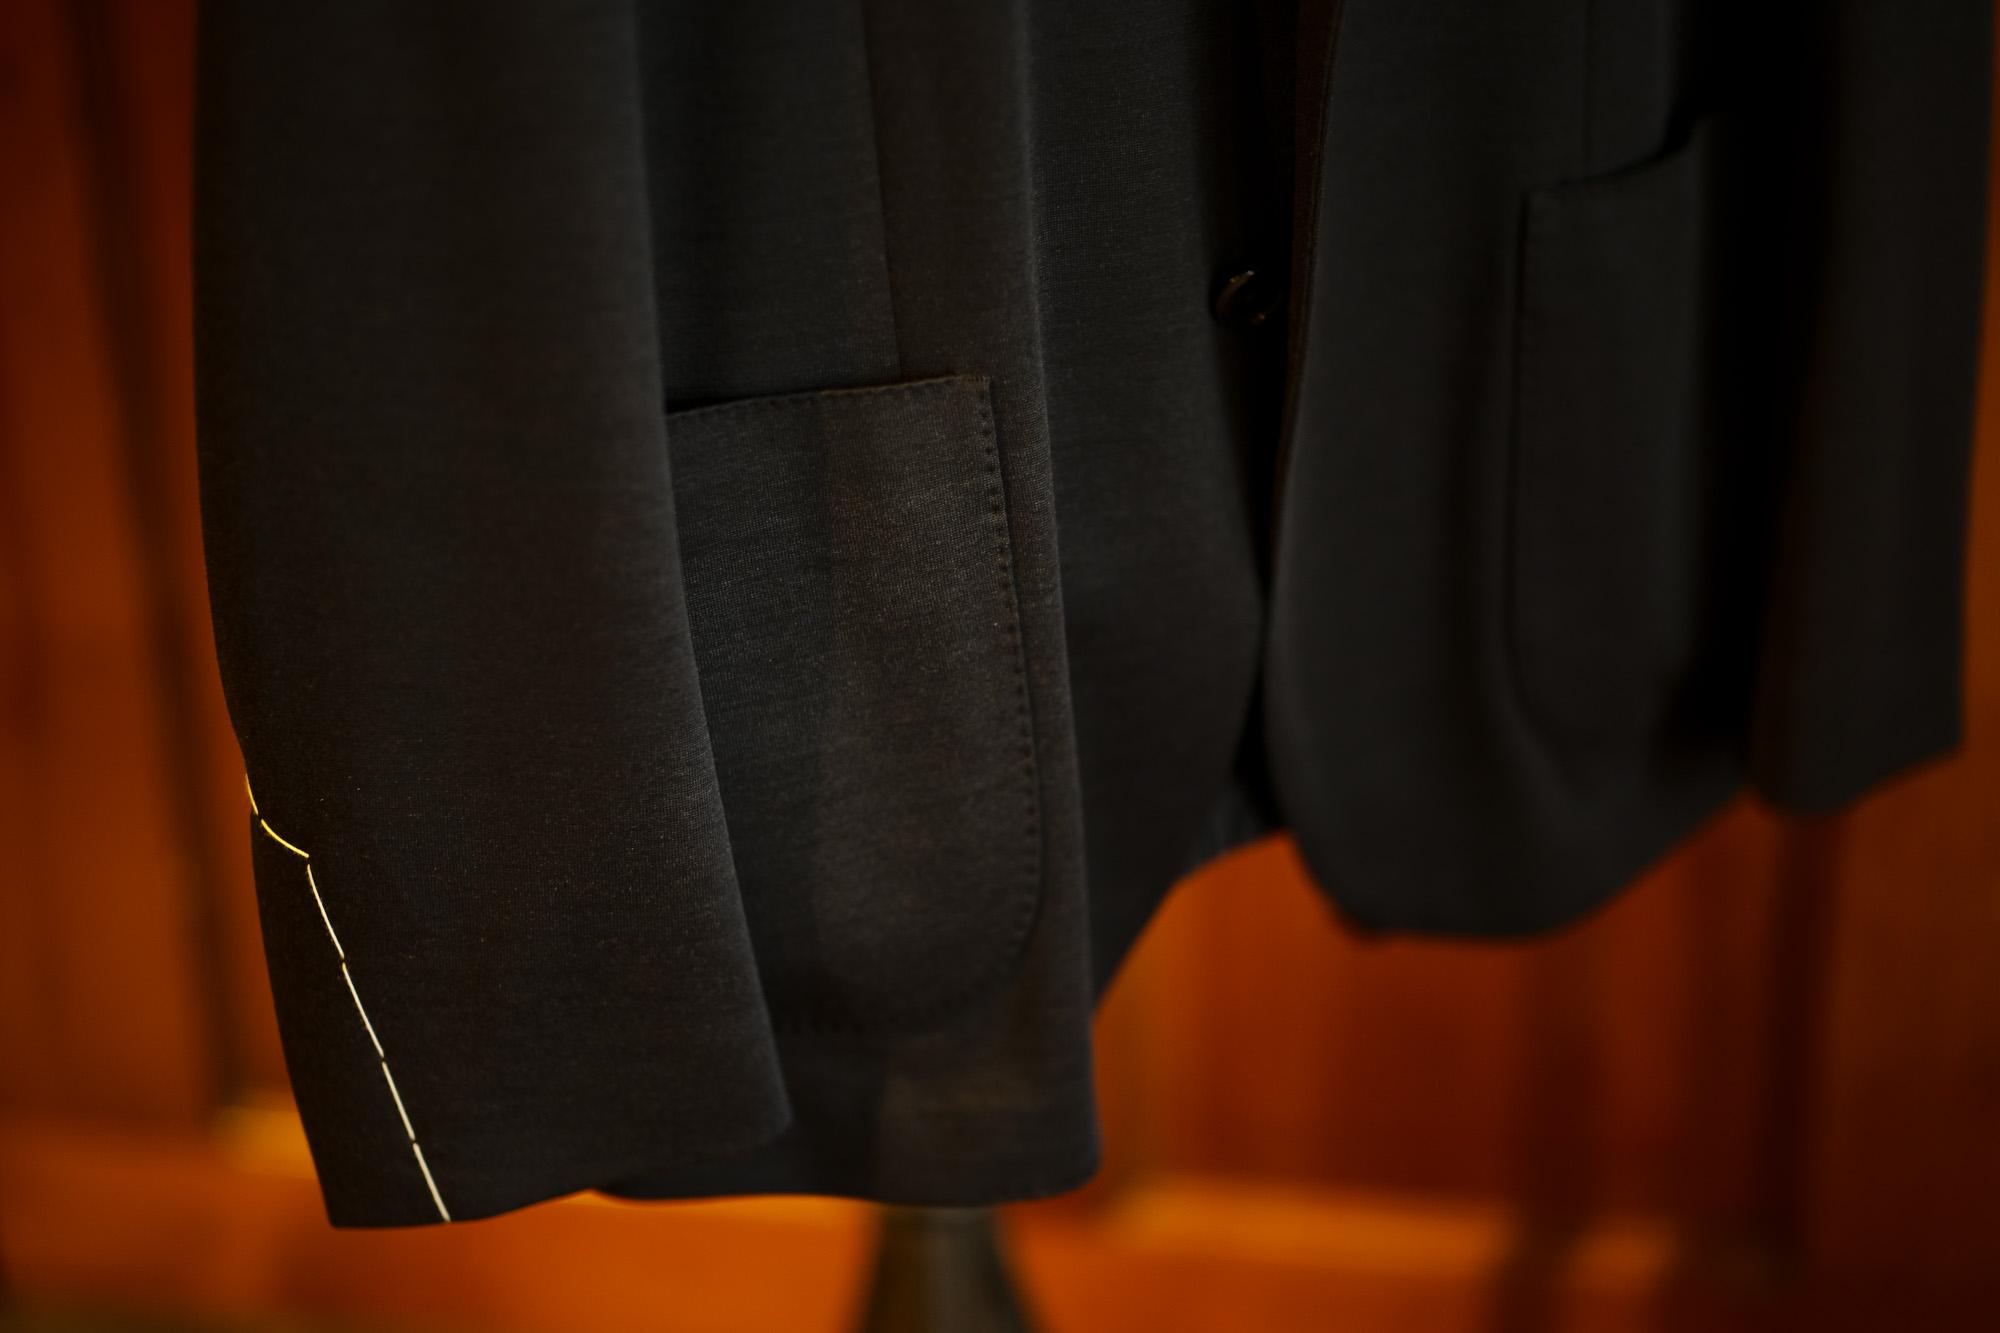 LARDINI (ラルディーニ) EASY WEAR (イージーウエア) Pakkaburu Jersey Suit パッカブルジャージスーツ NAVY (ネイビー・2) 2019 秋冬新作 愛知 名古屋 altoediritto アルトエデリット